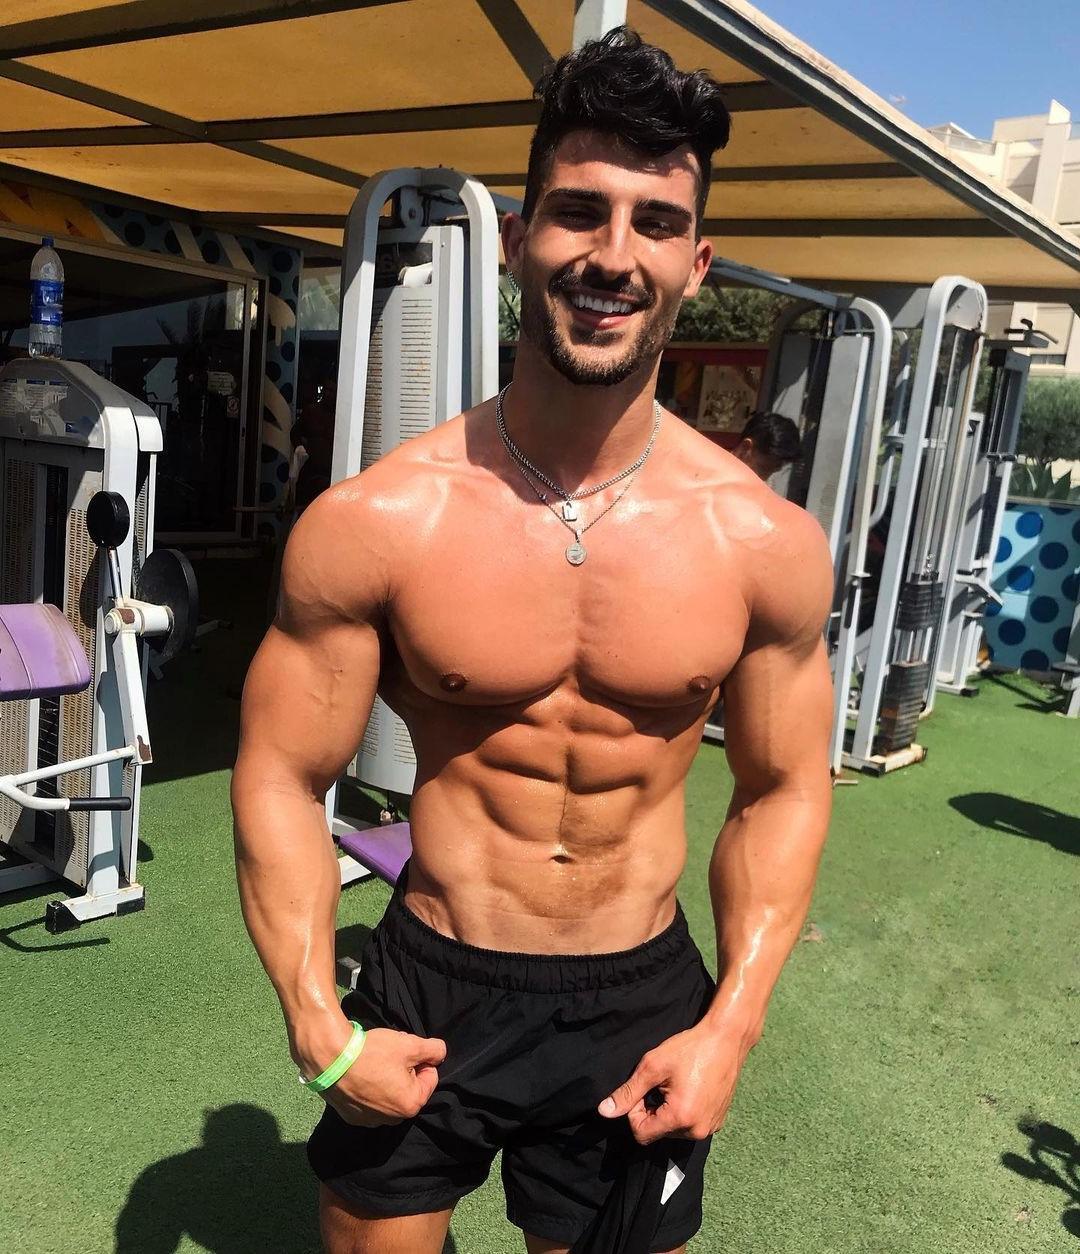 handsome-brazilian-bodybuilder-model-nicholas-gala-smiling-shirtless-shiny-muscular-body-huge-pecs